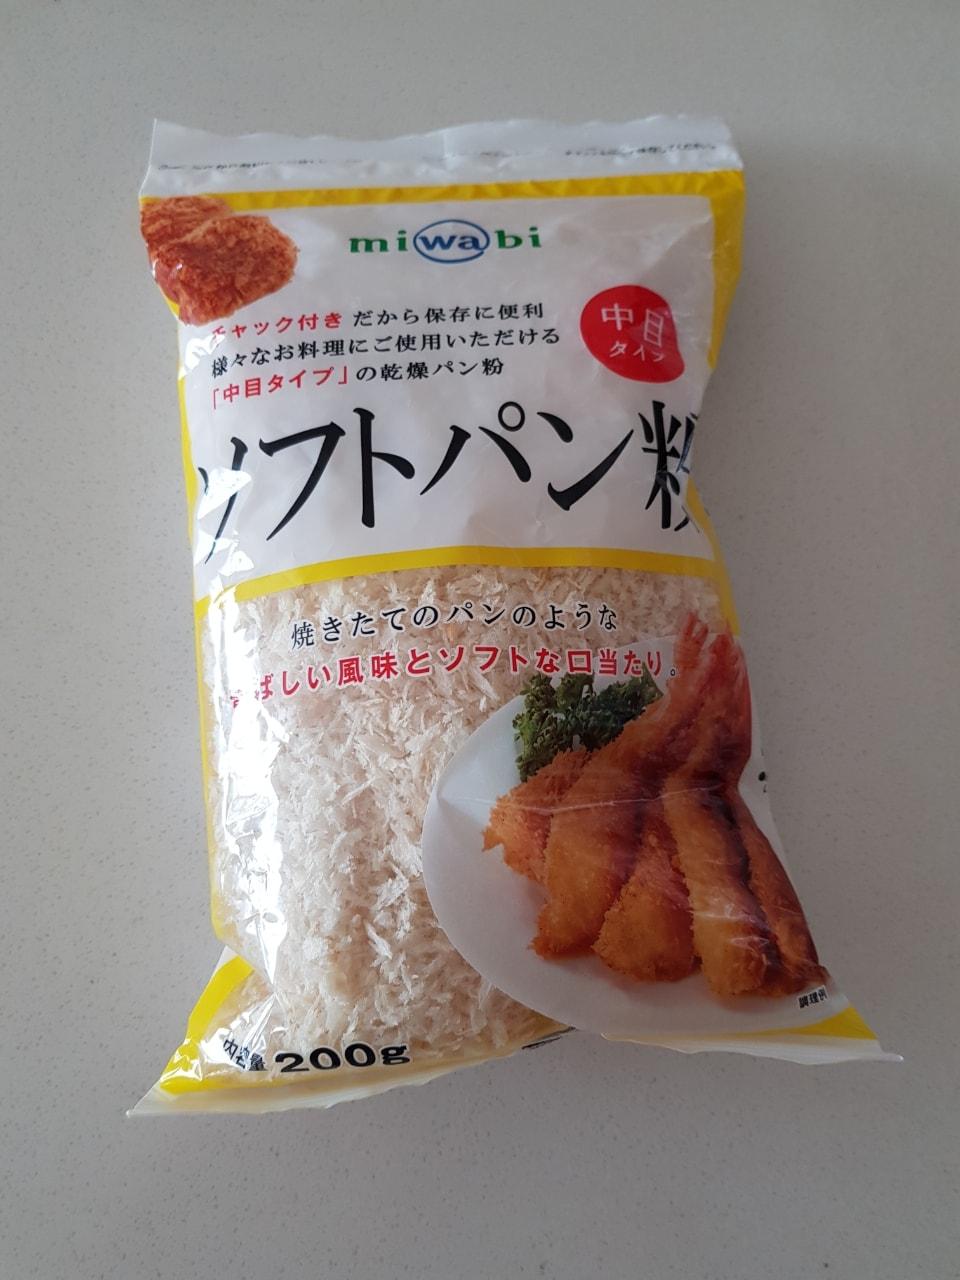 Miwabi Panko